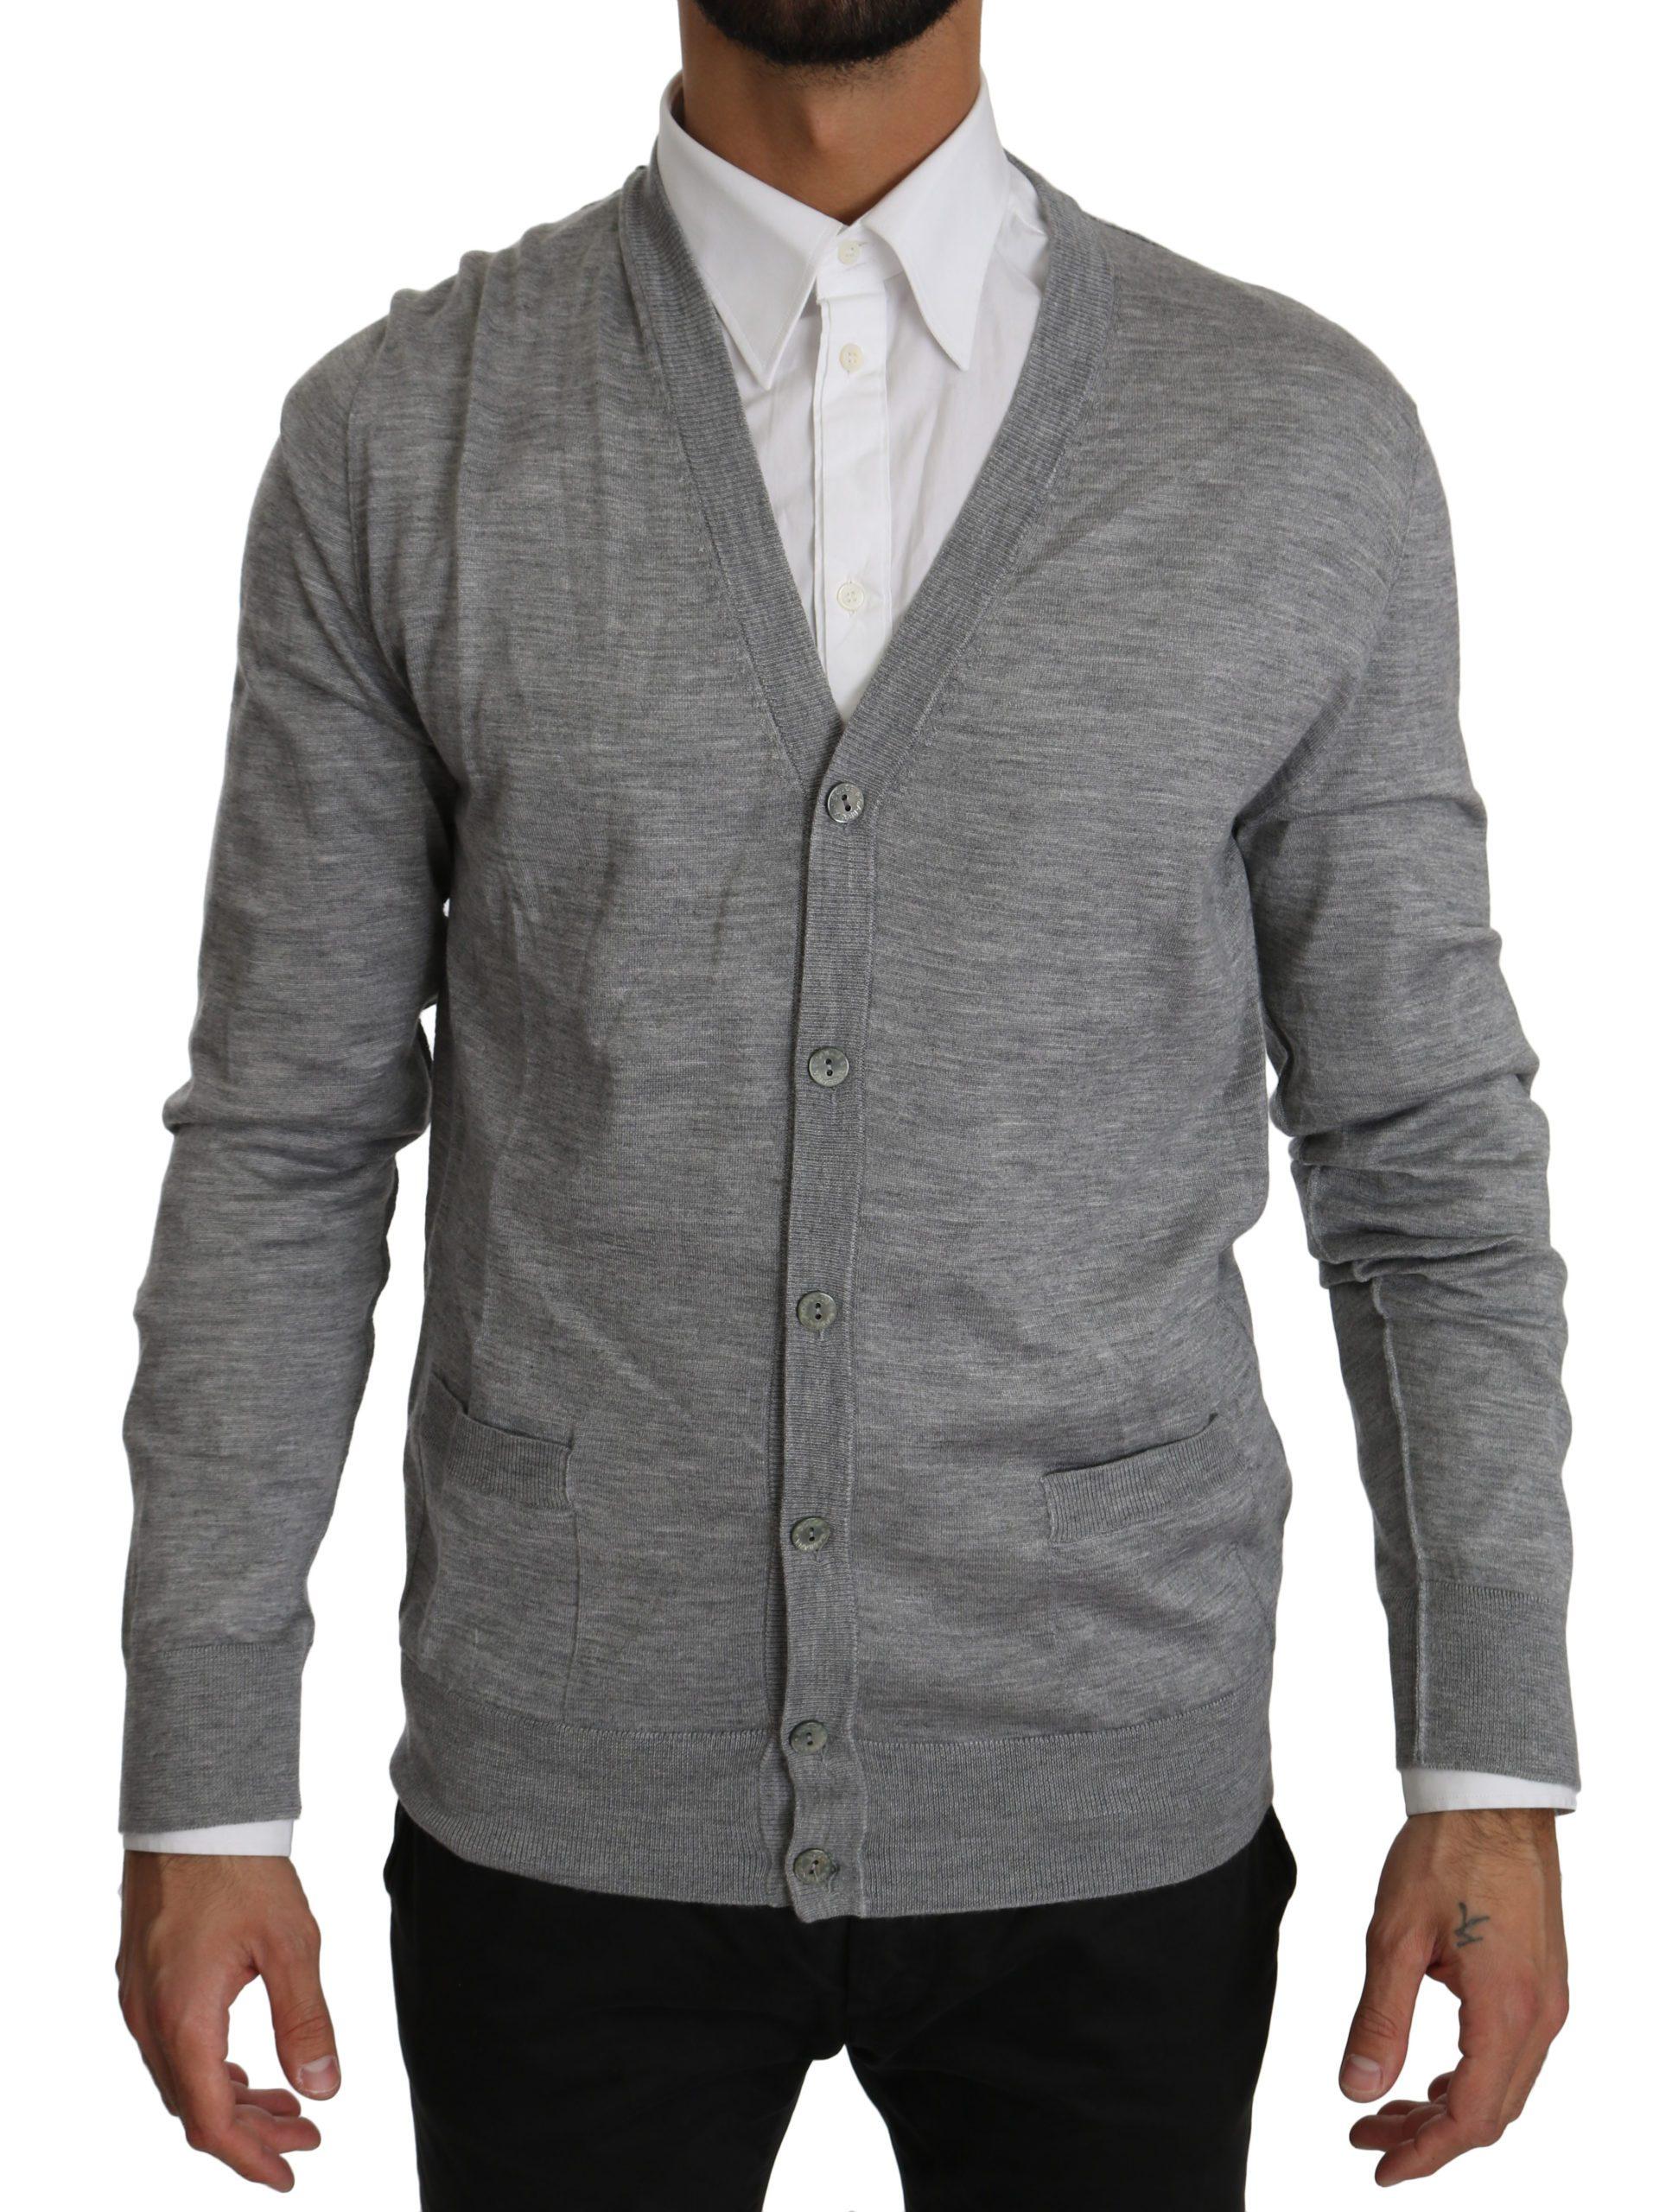 Dolce & Gabbana Men's Button Down Cashmere Cardigan Gray TSH4031 - IT50 | L